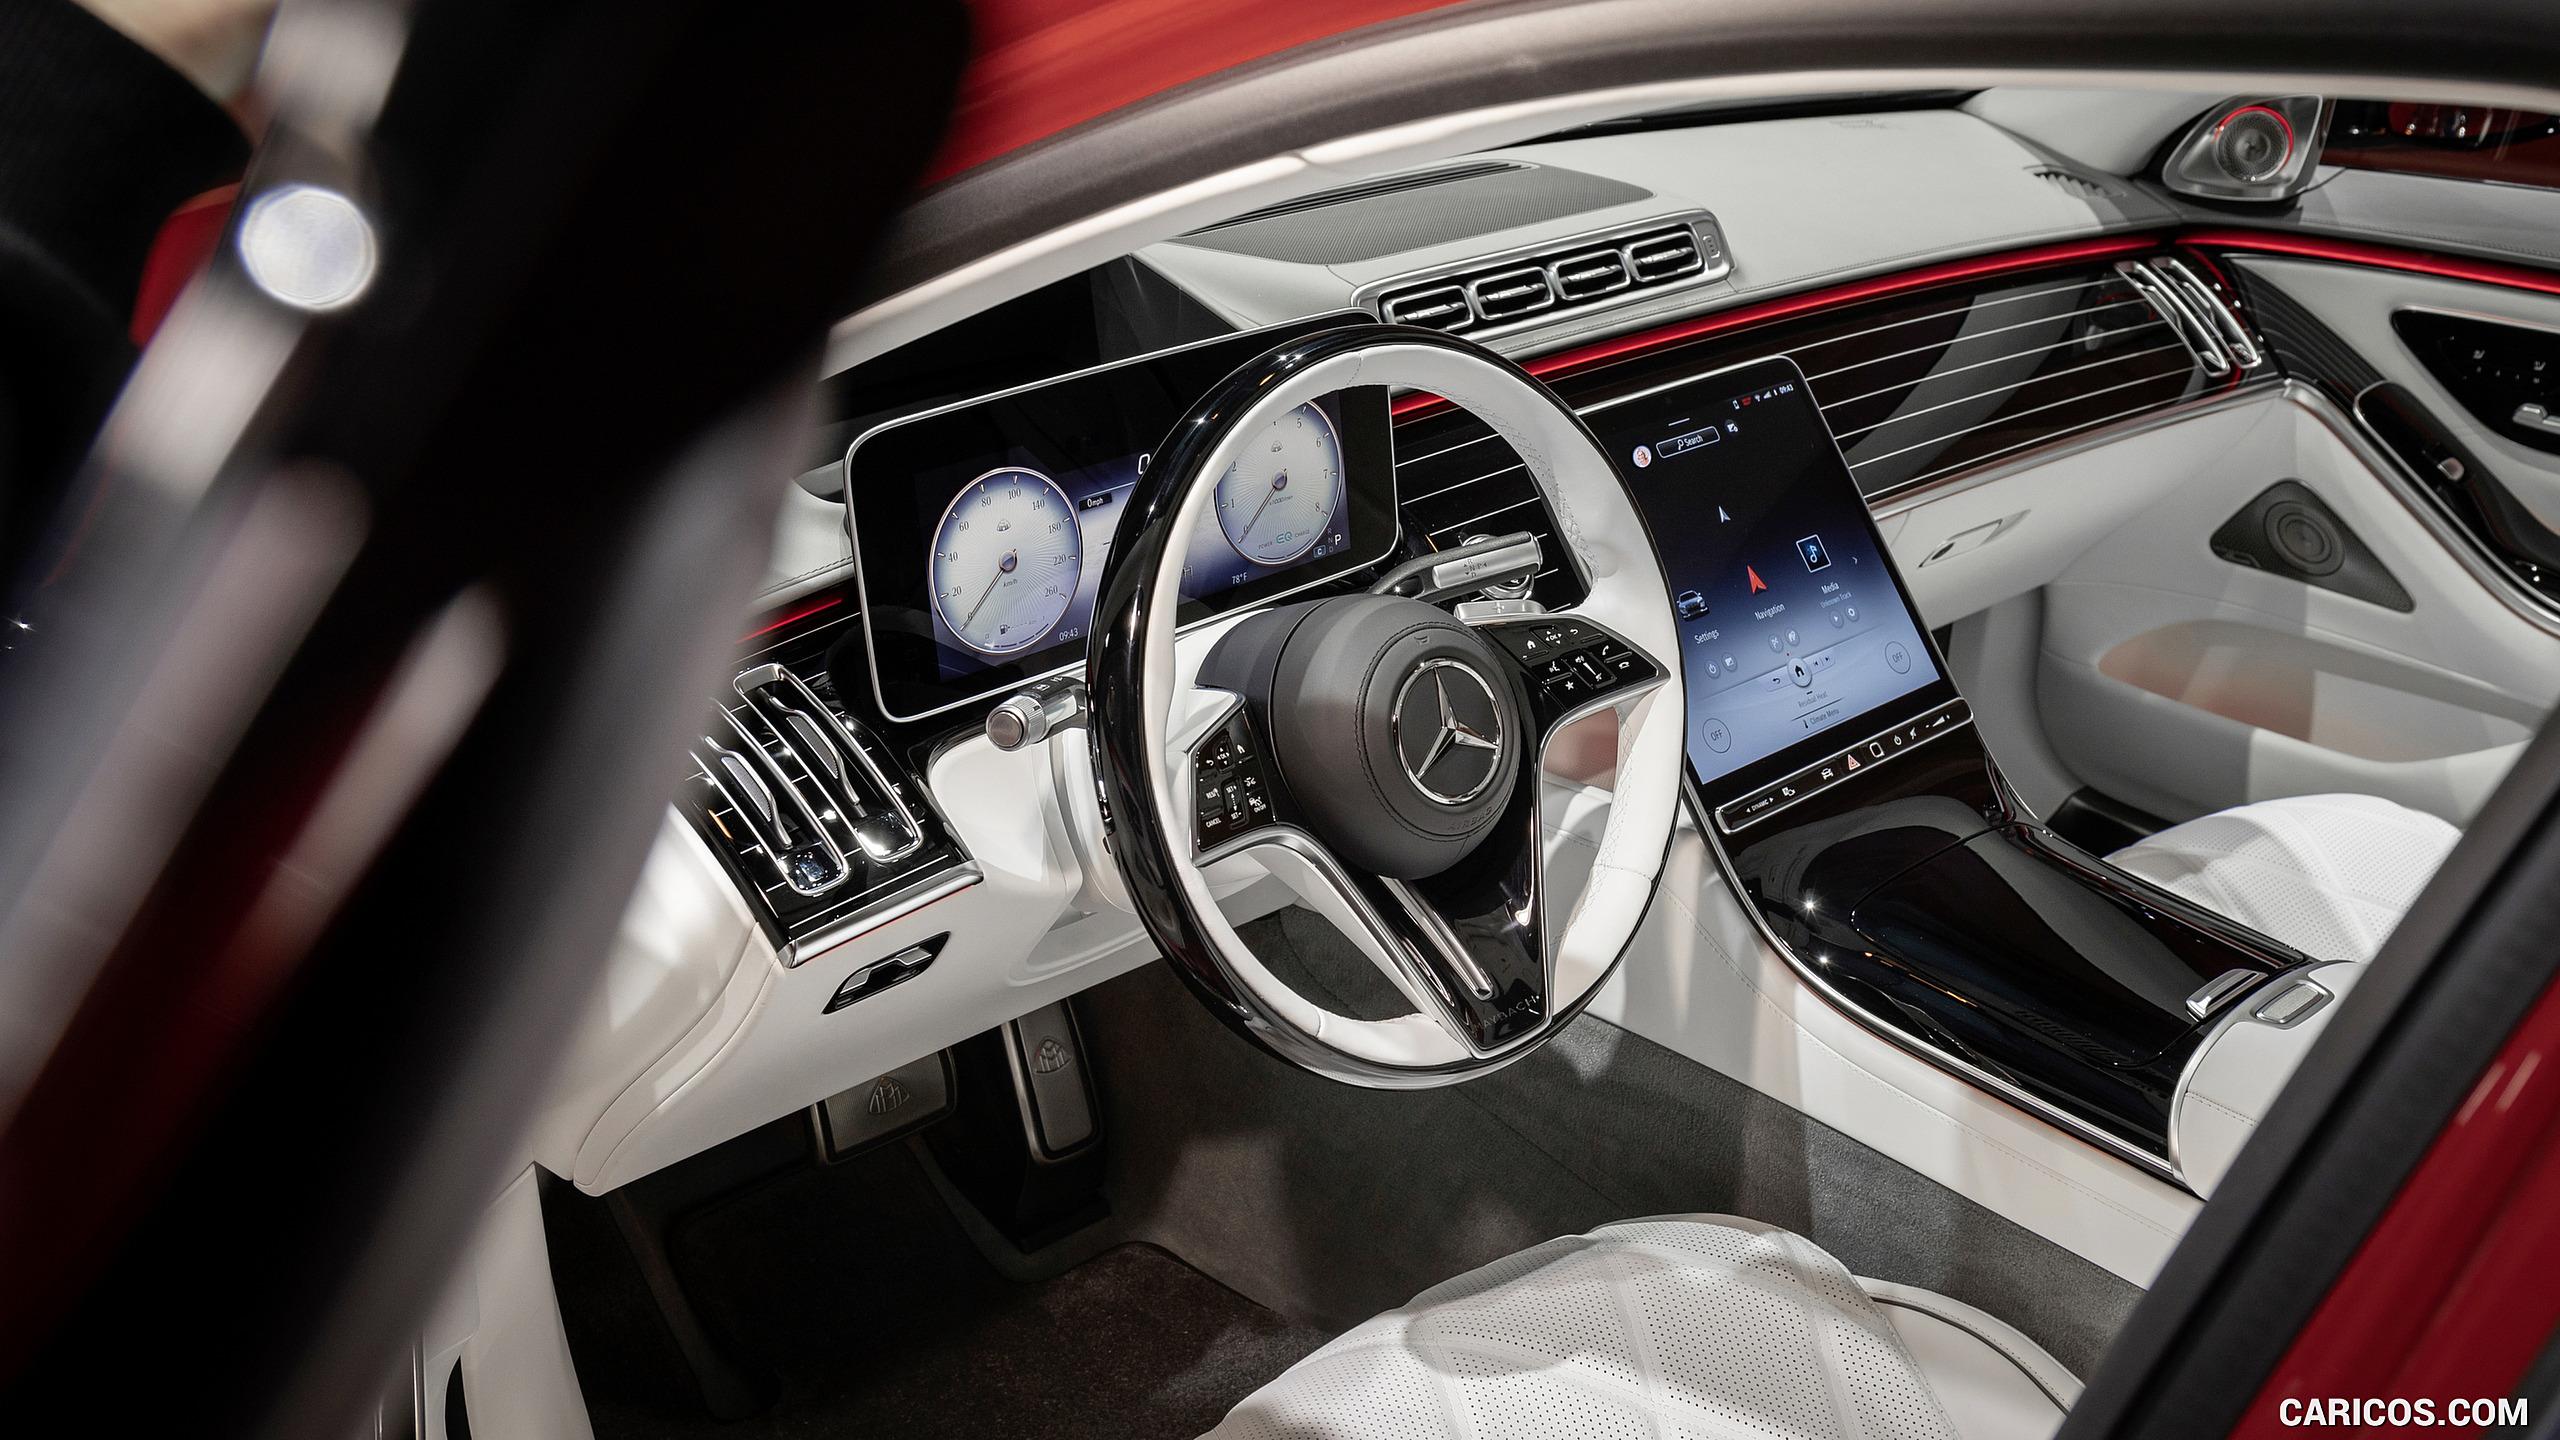 2021 Mercedes Maybach S Class   Interior Caricos 2560x1440